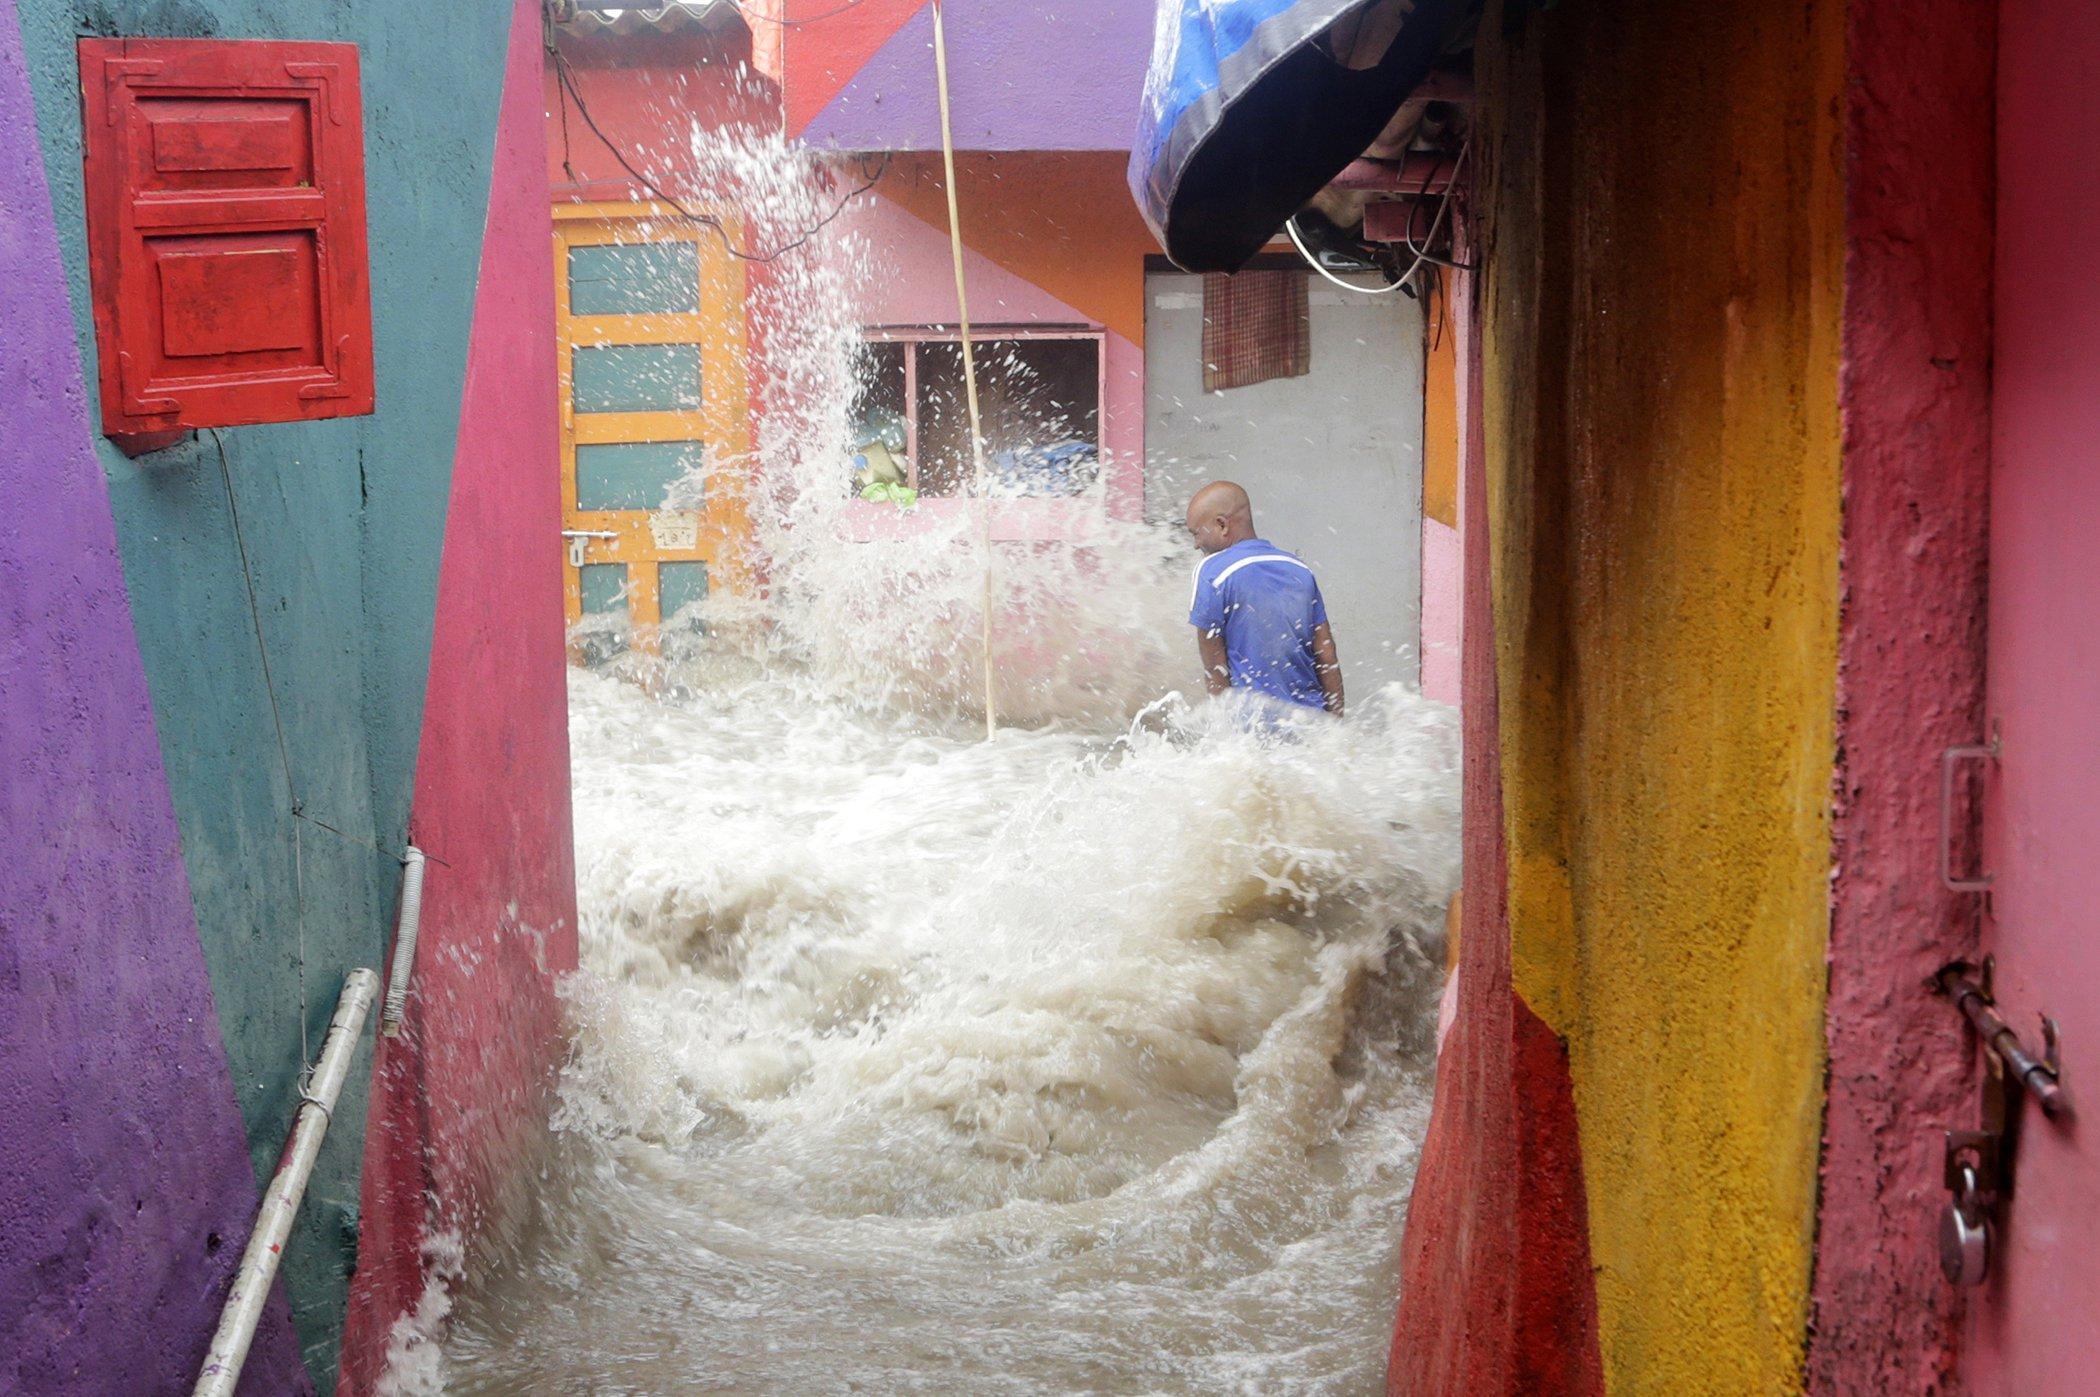 Environmental-Photos-July-India-Flooding.jpg